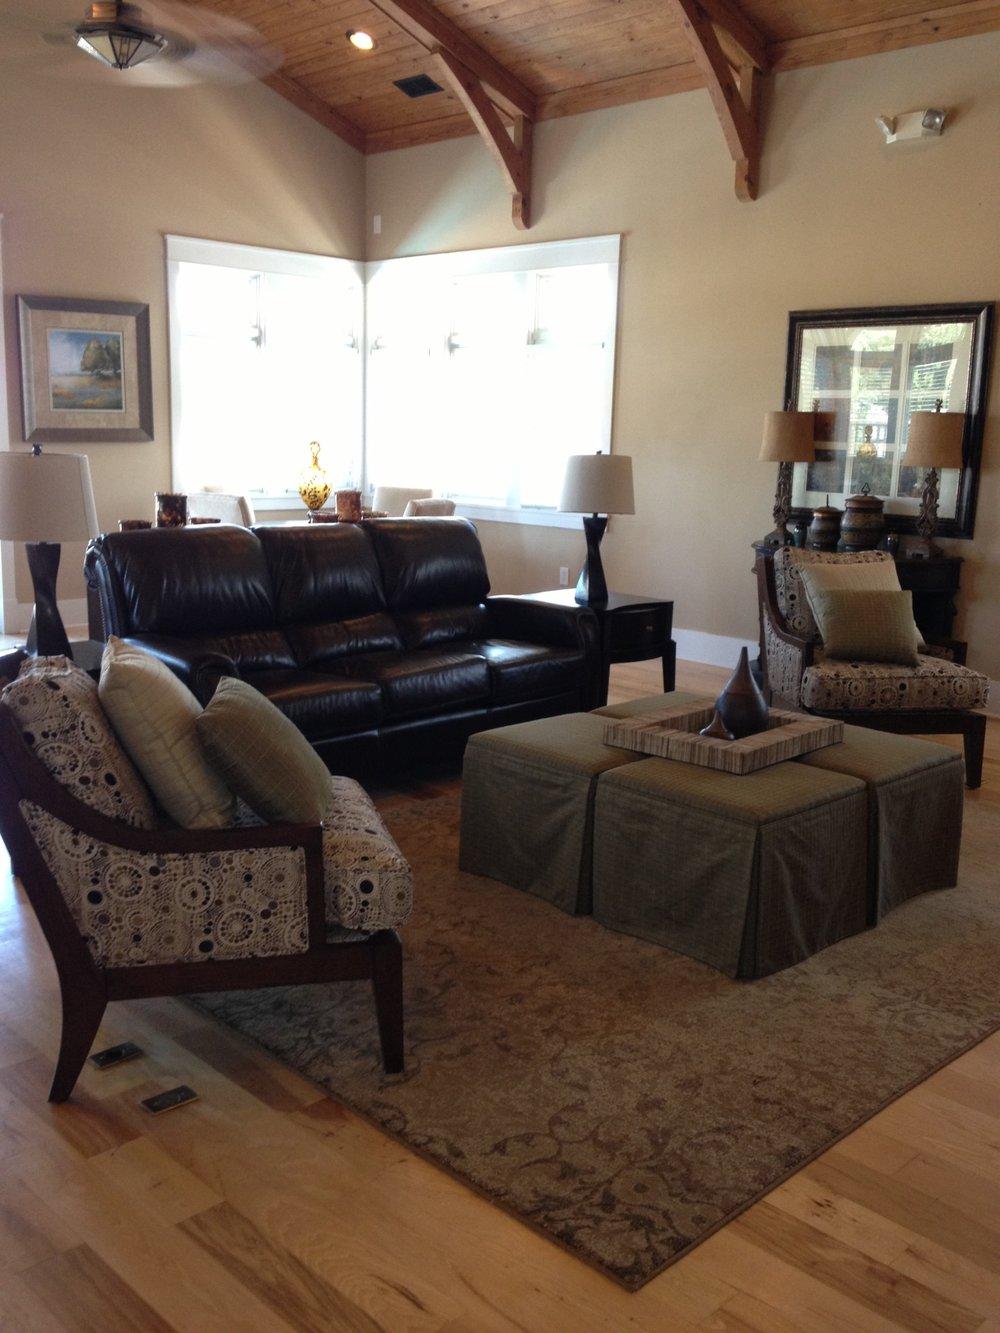 Interior Design Services Furniture Services Inc